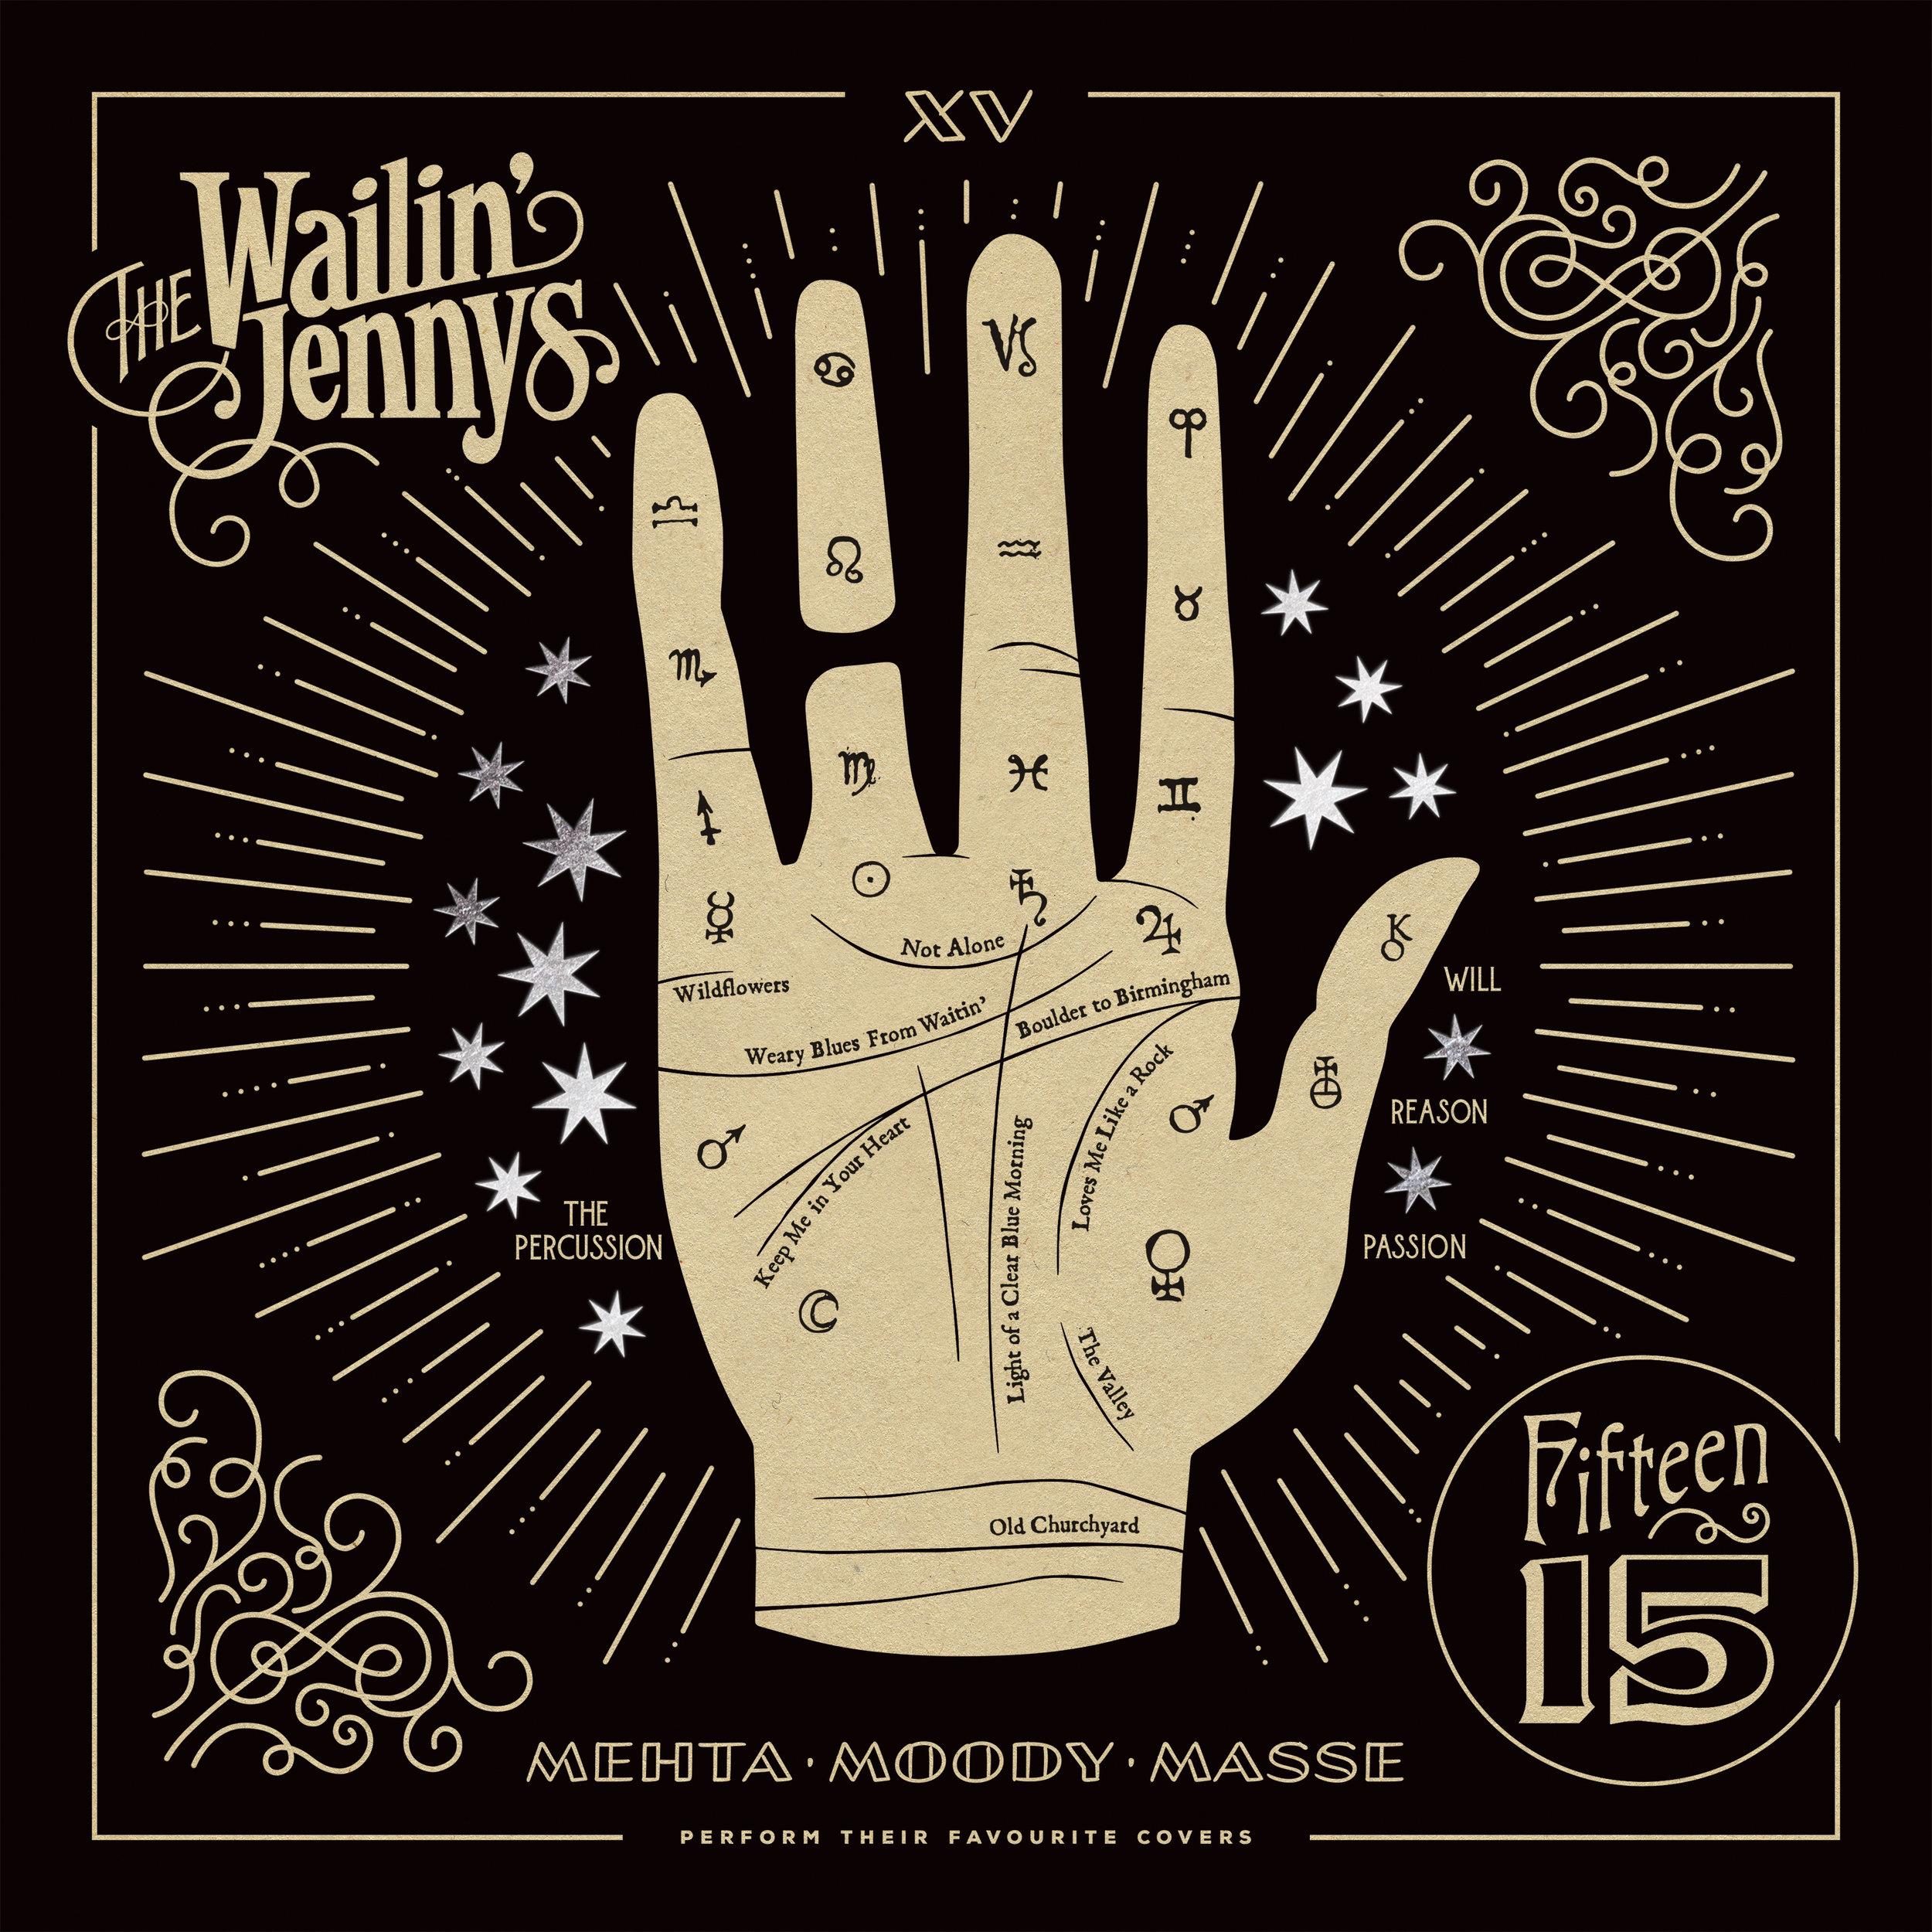 The Wailin' Jennys - Fifteen